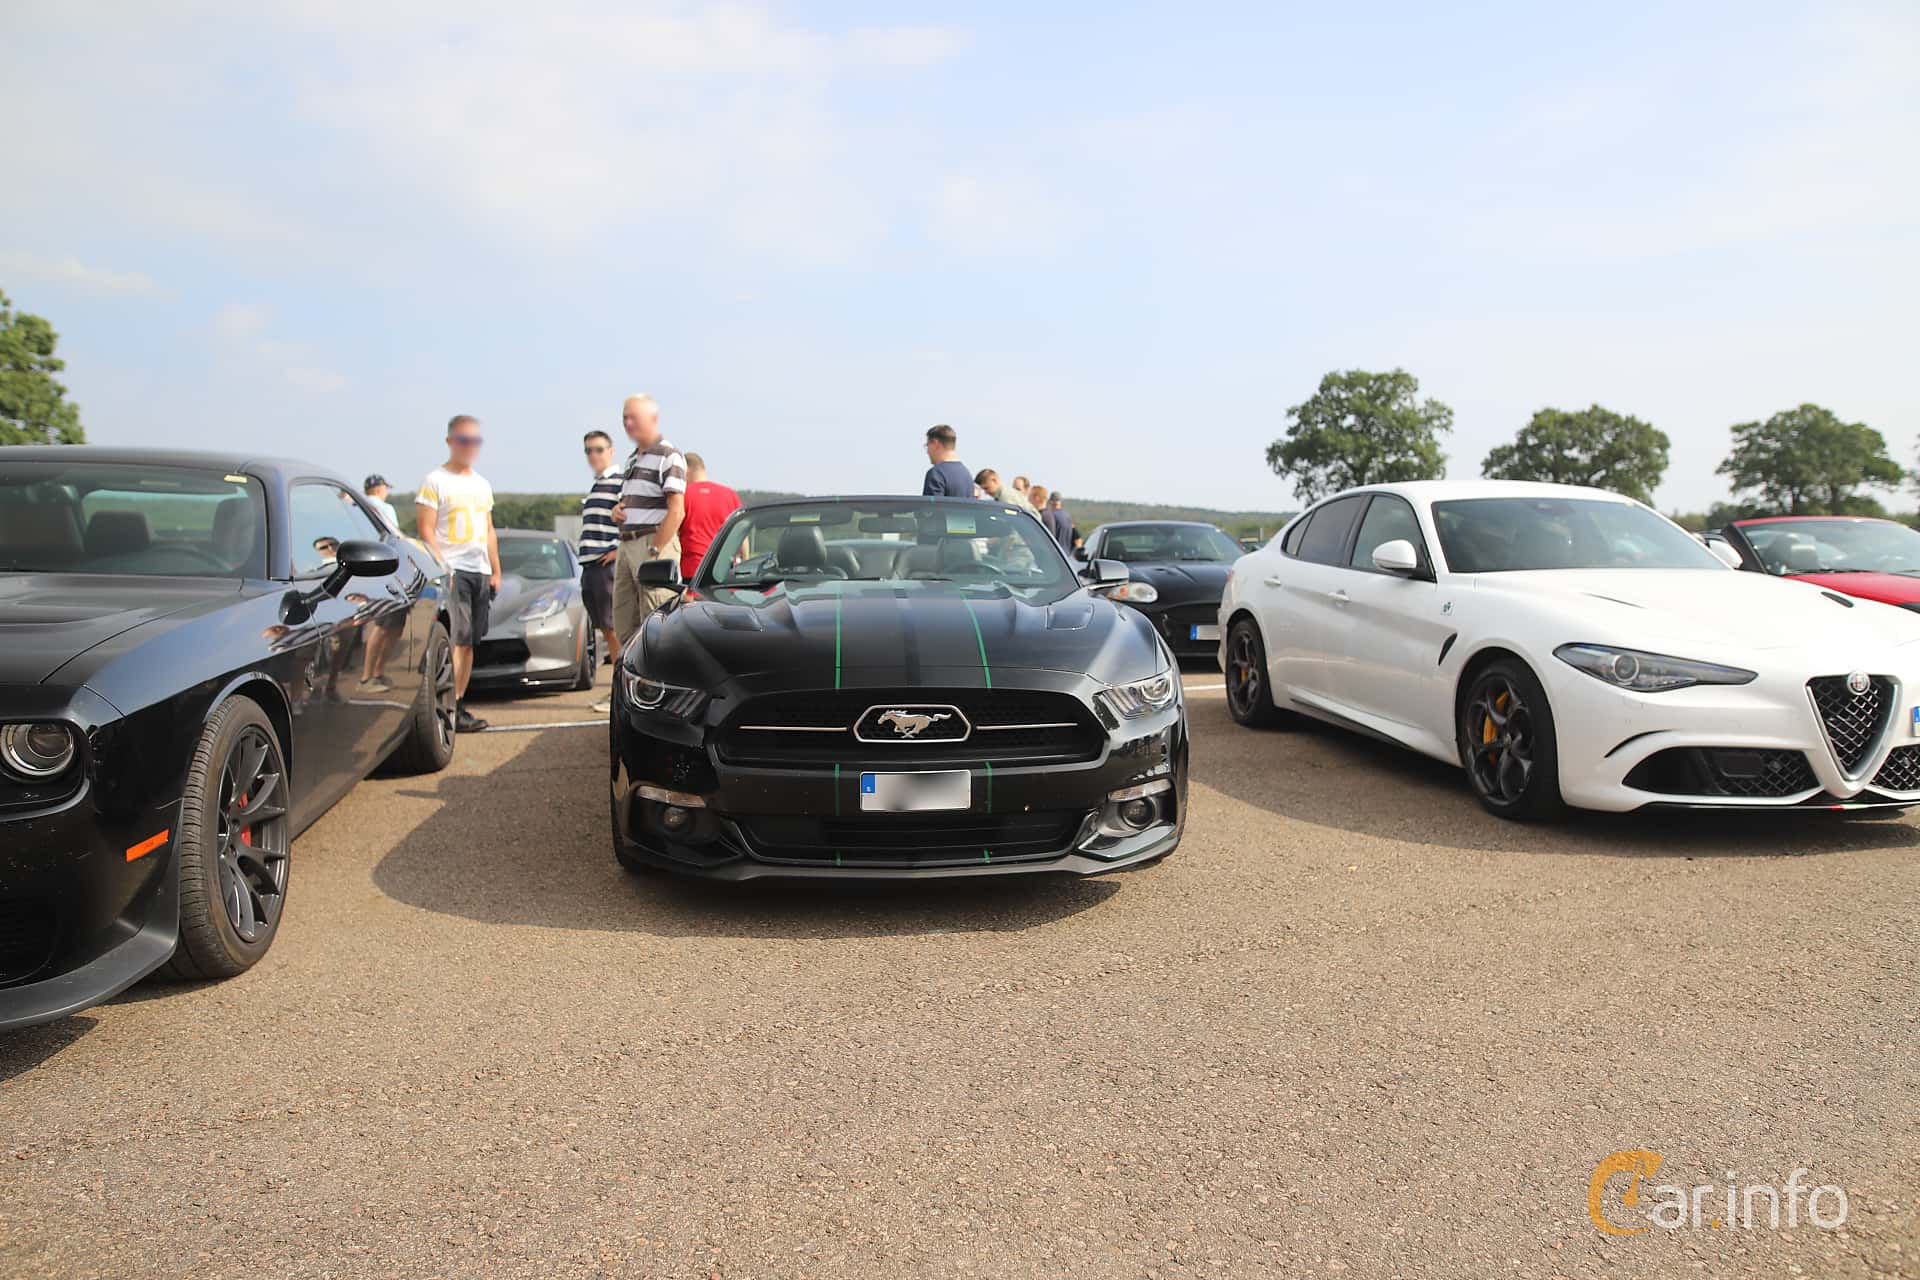 Ford Mustang GT Convertible 5.0 V8 SelectShift, 440hp, 2015 at Autoropa Racing day Knutstorp 2019